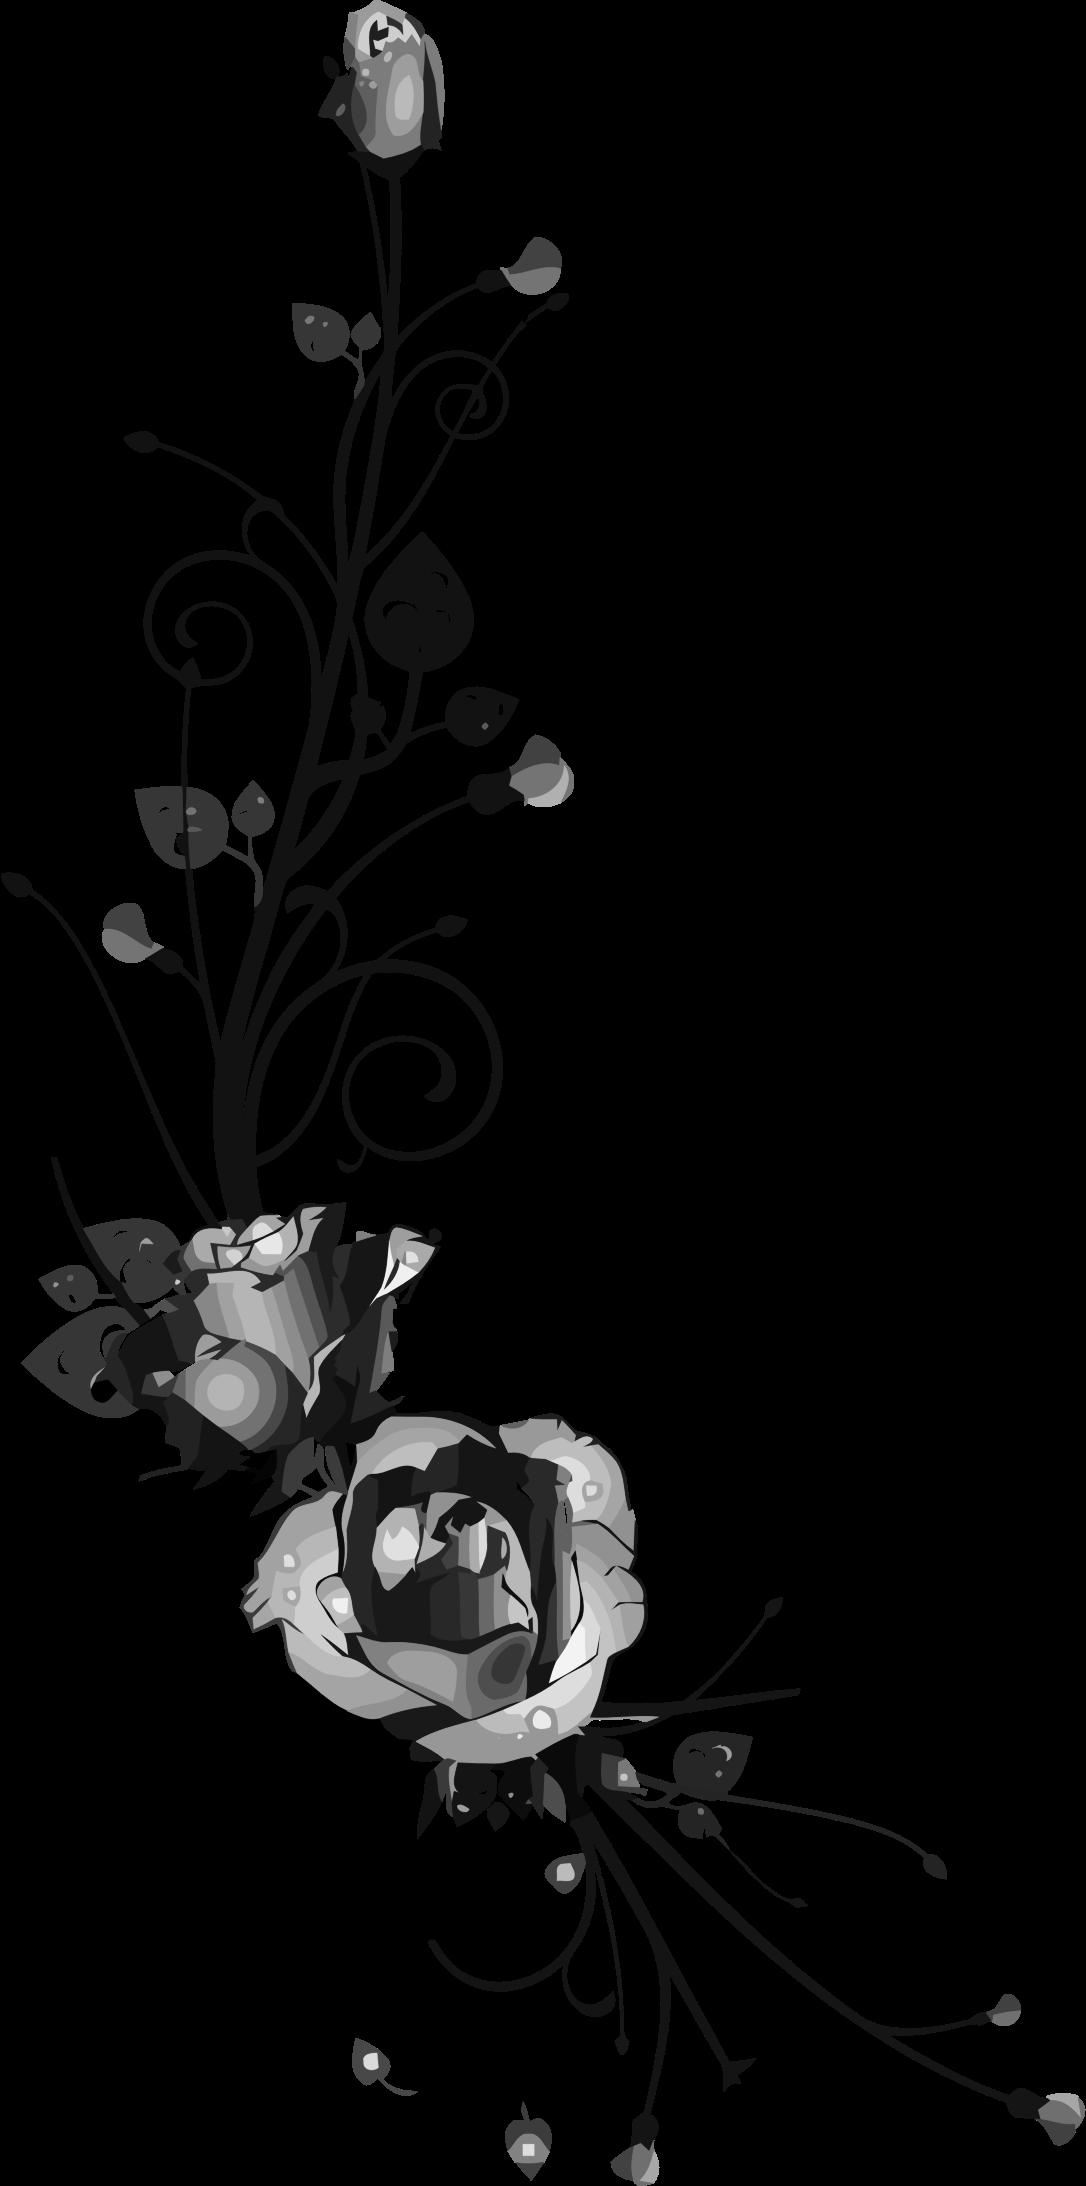 Rose floral big image. Flourish clipart flower